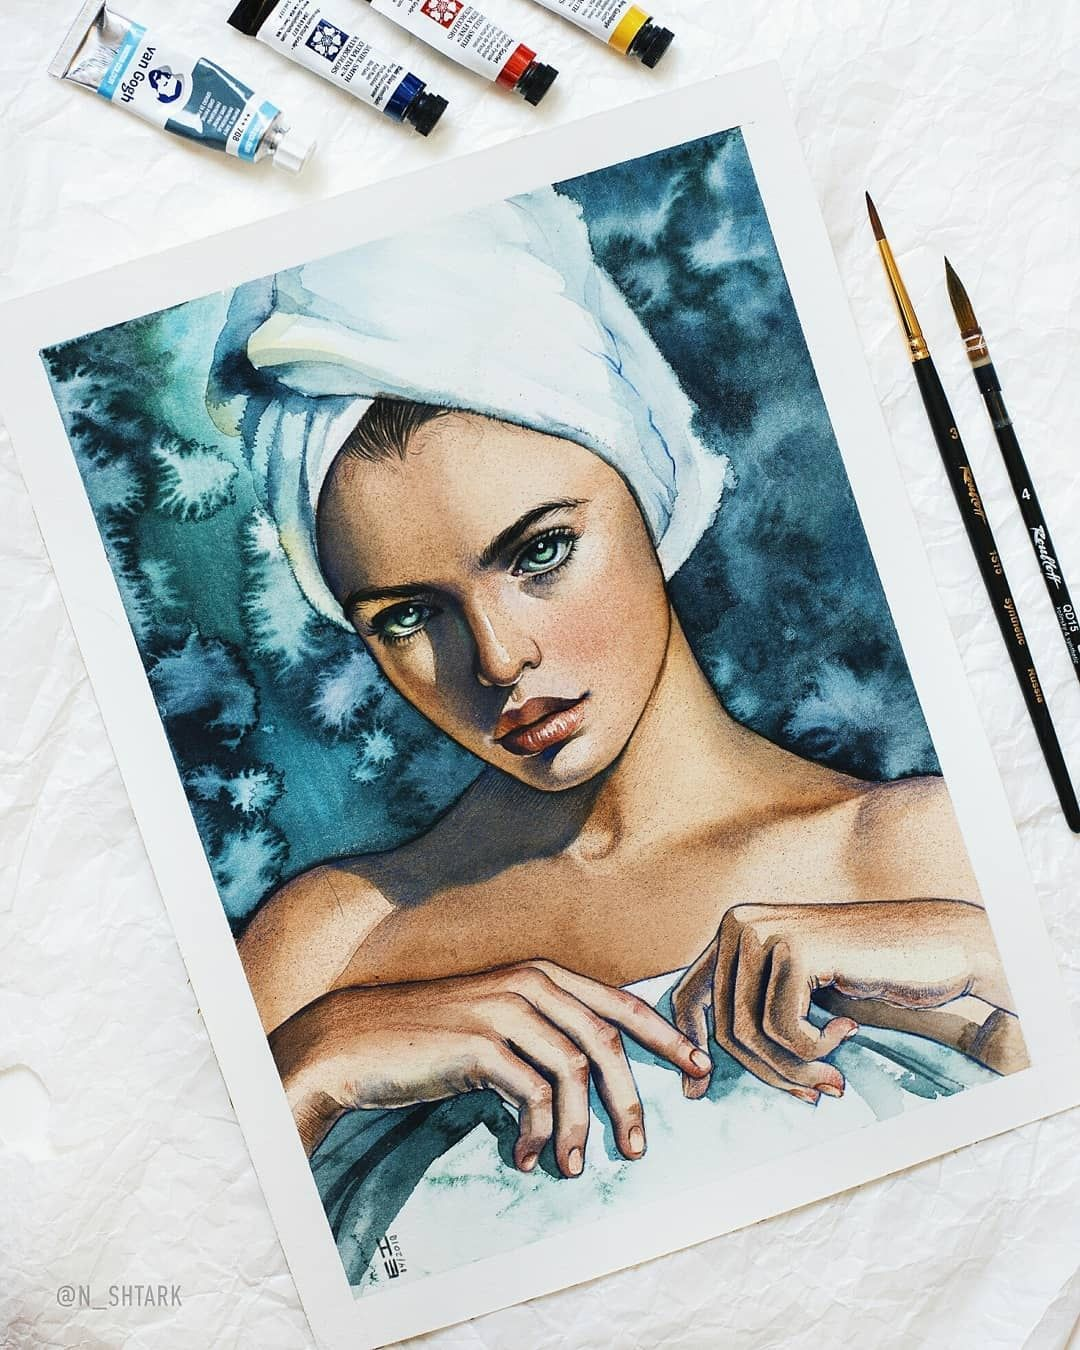 Watercolor Portrait Towel Woman Watercolorist N Shtark